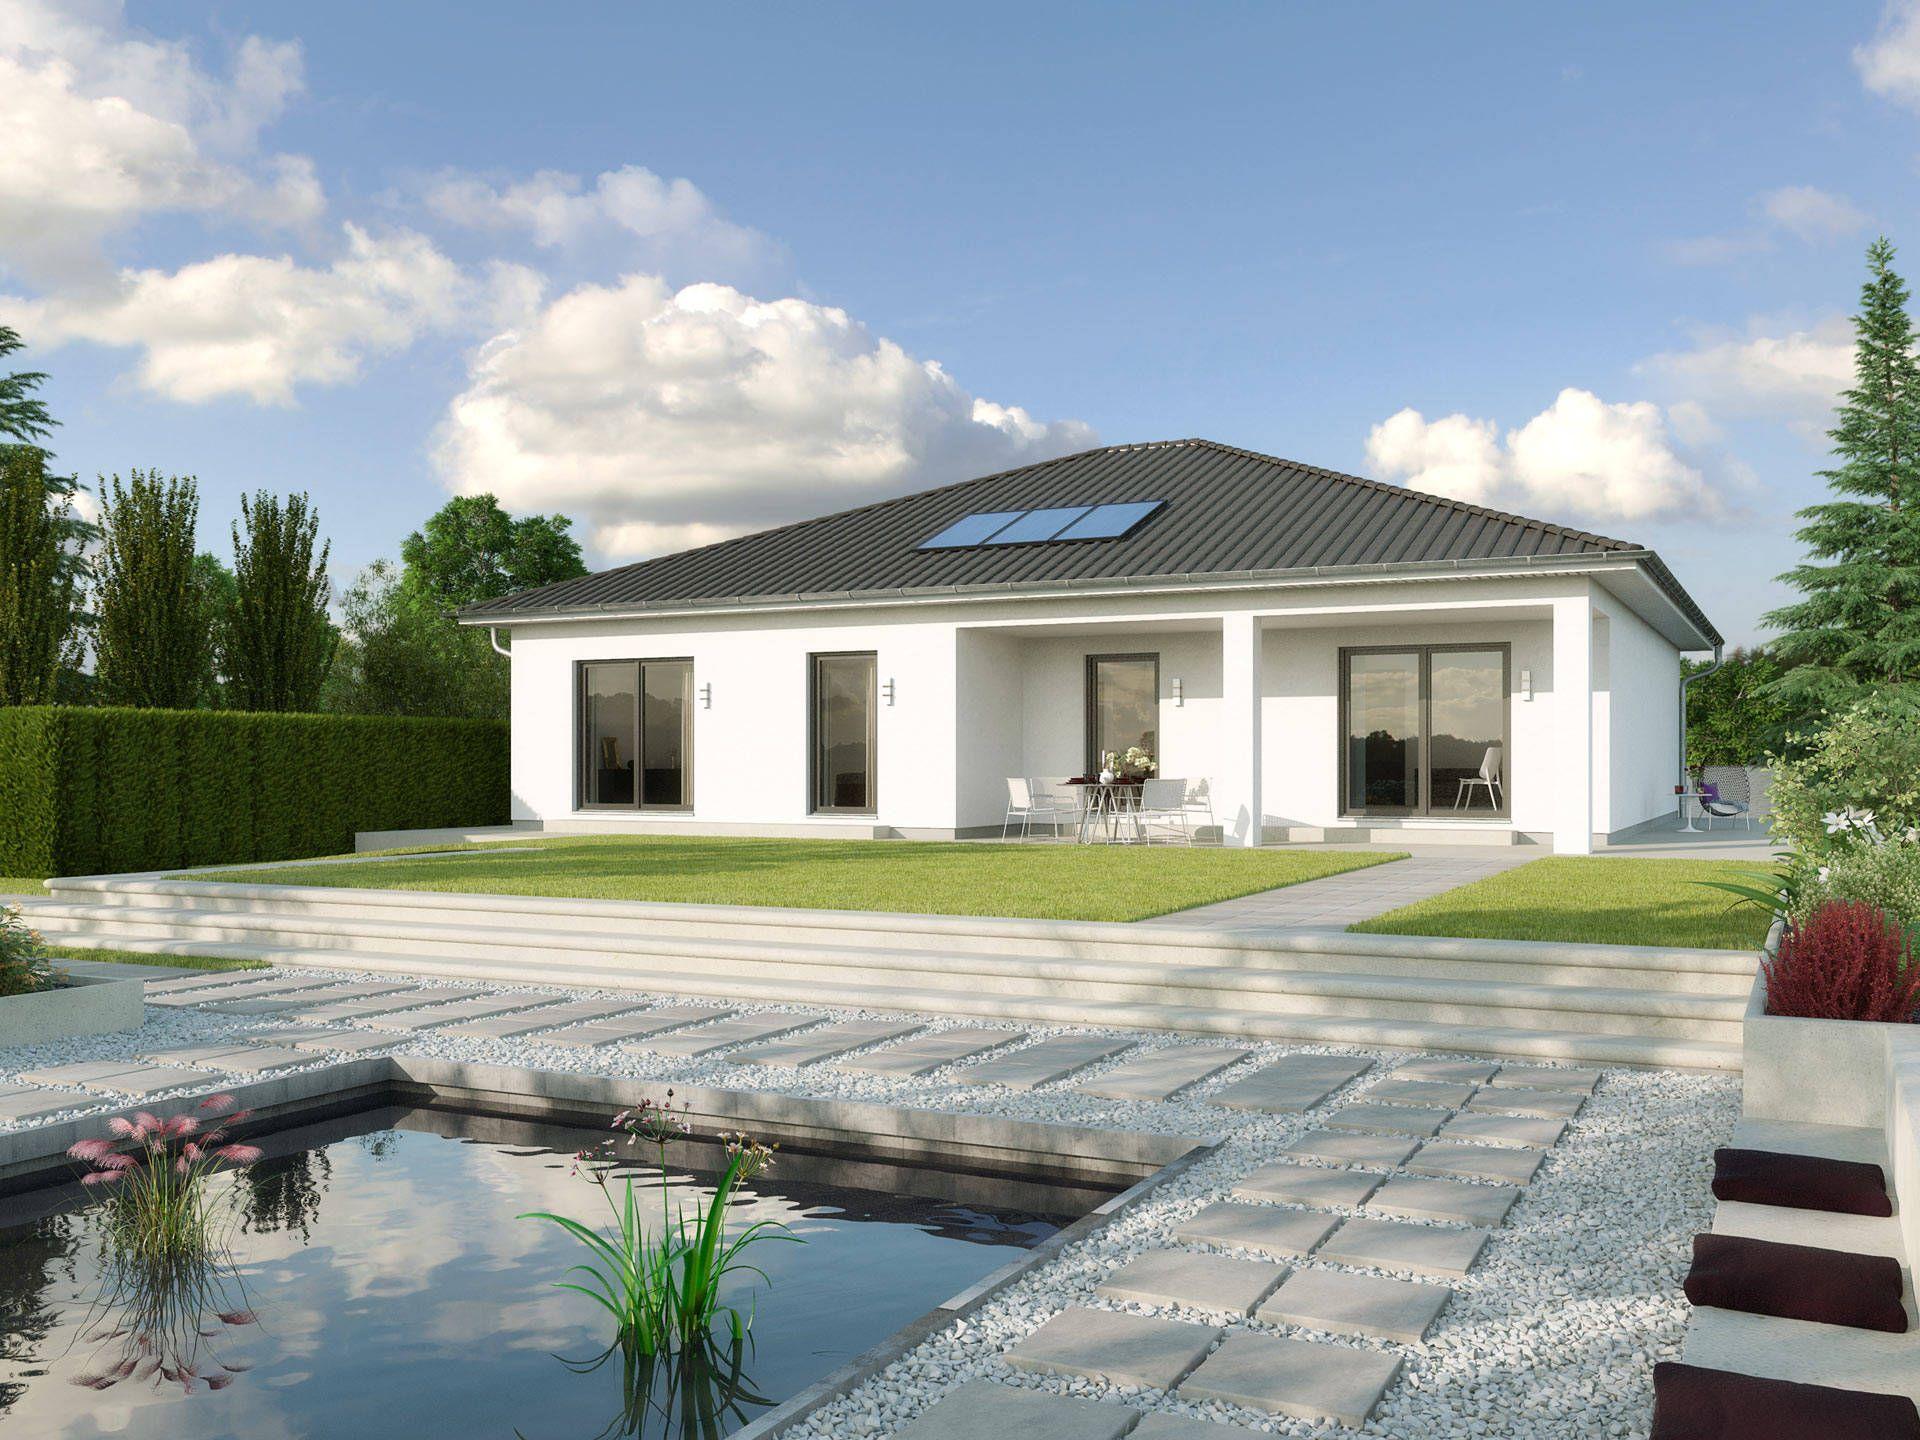 Larochelle wl 40 bungalow von gussek haus elegantes for Modernes haus 160 qm